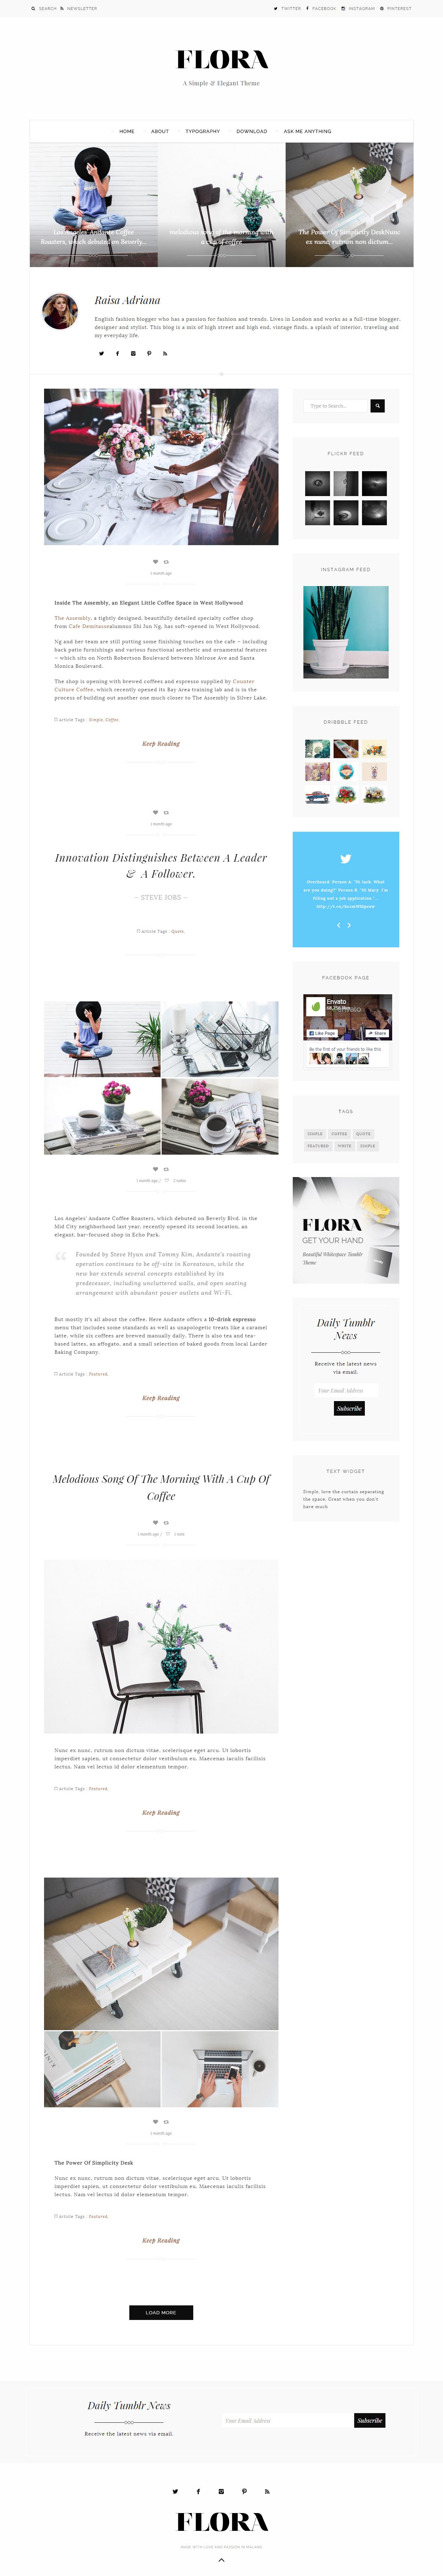 Flora - Premium Responsive Tumblr Theme | Tumblr Responsive Themes